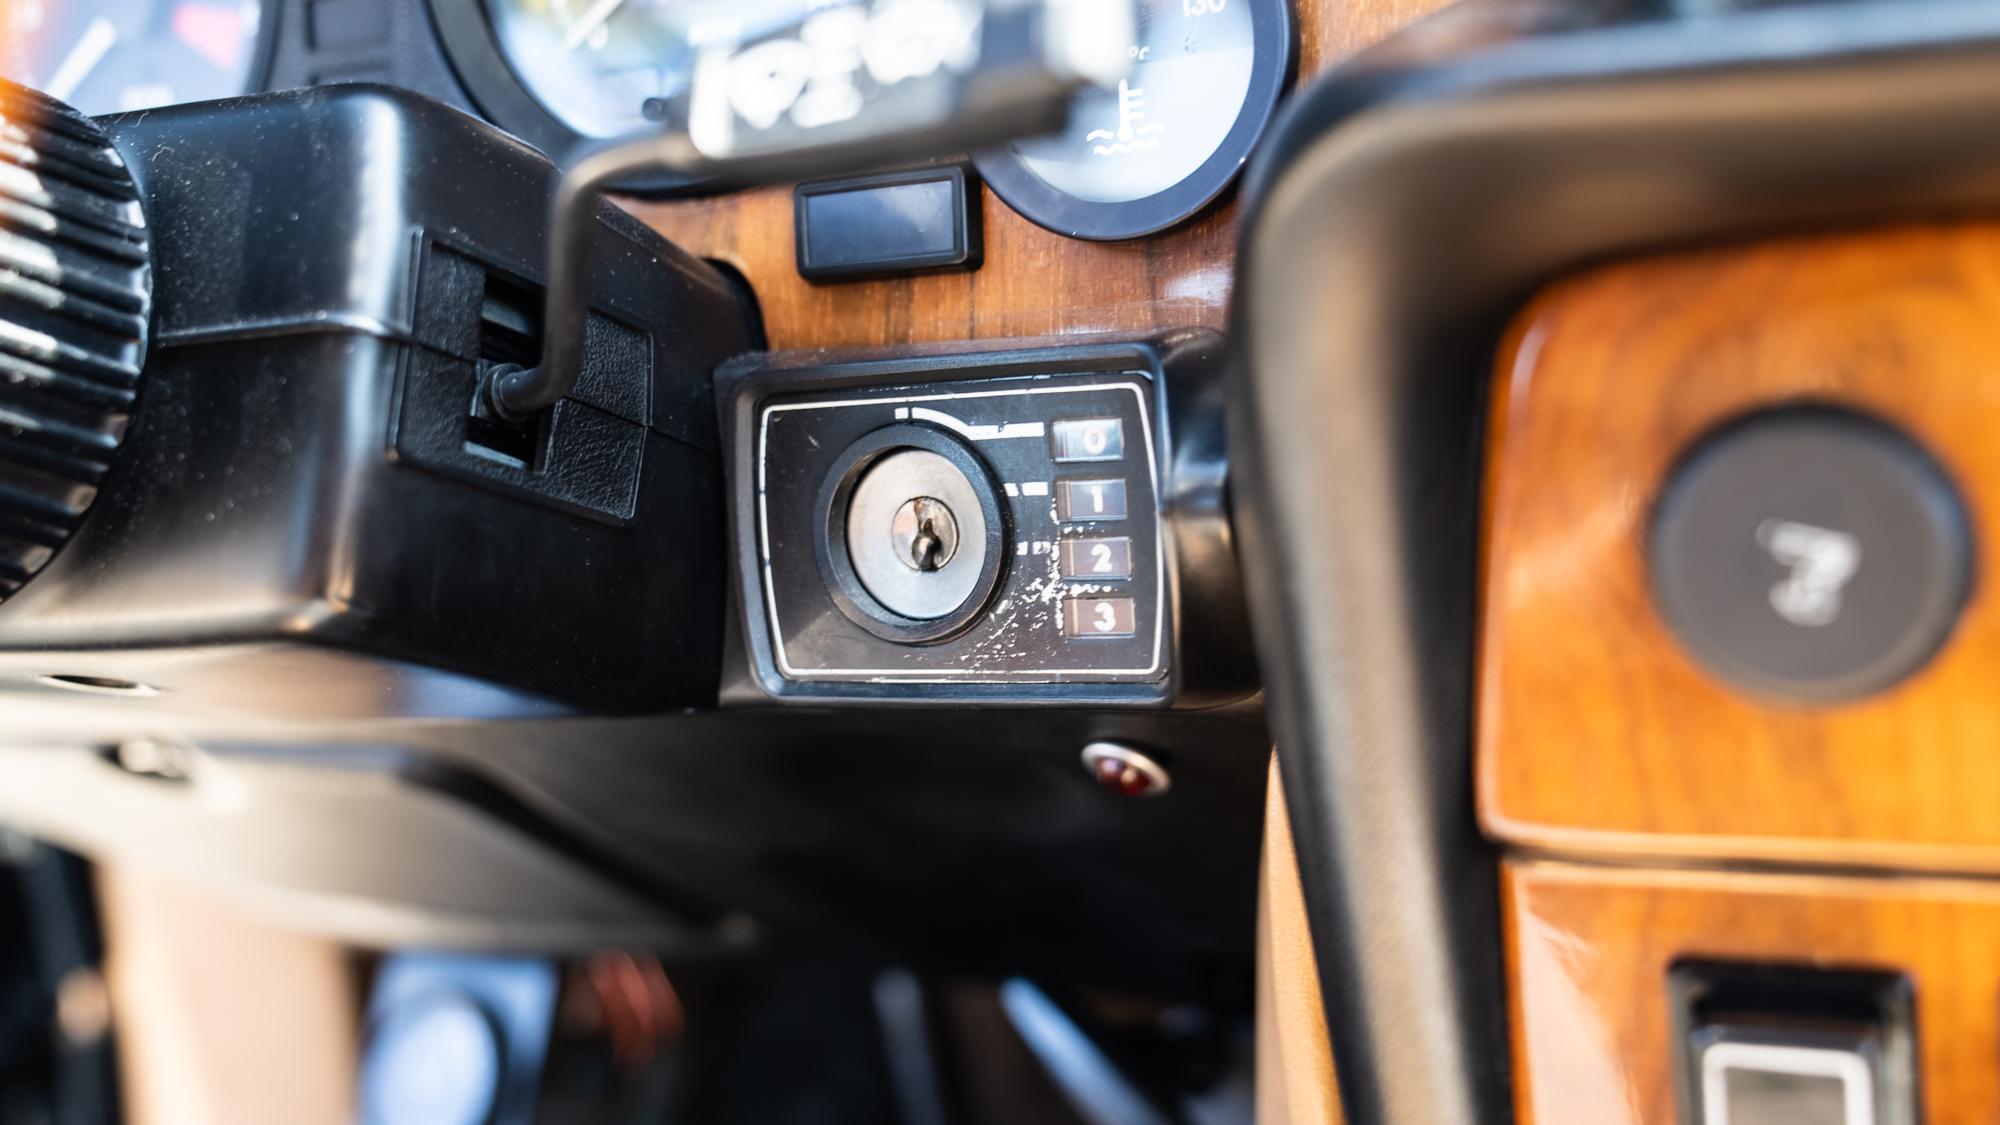 1986 Jaguar XJ6 interior